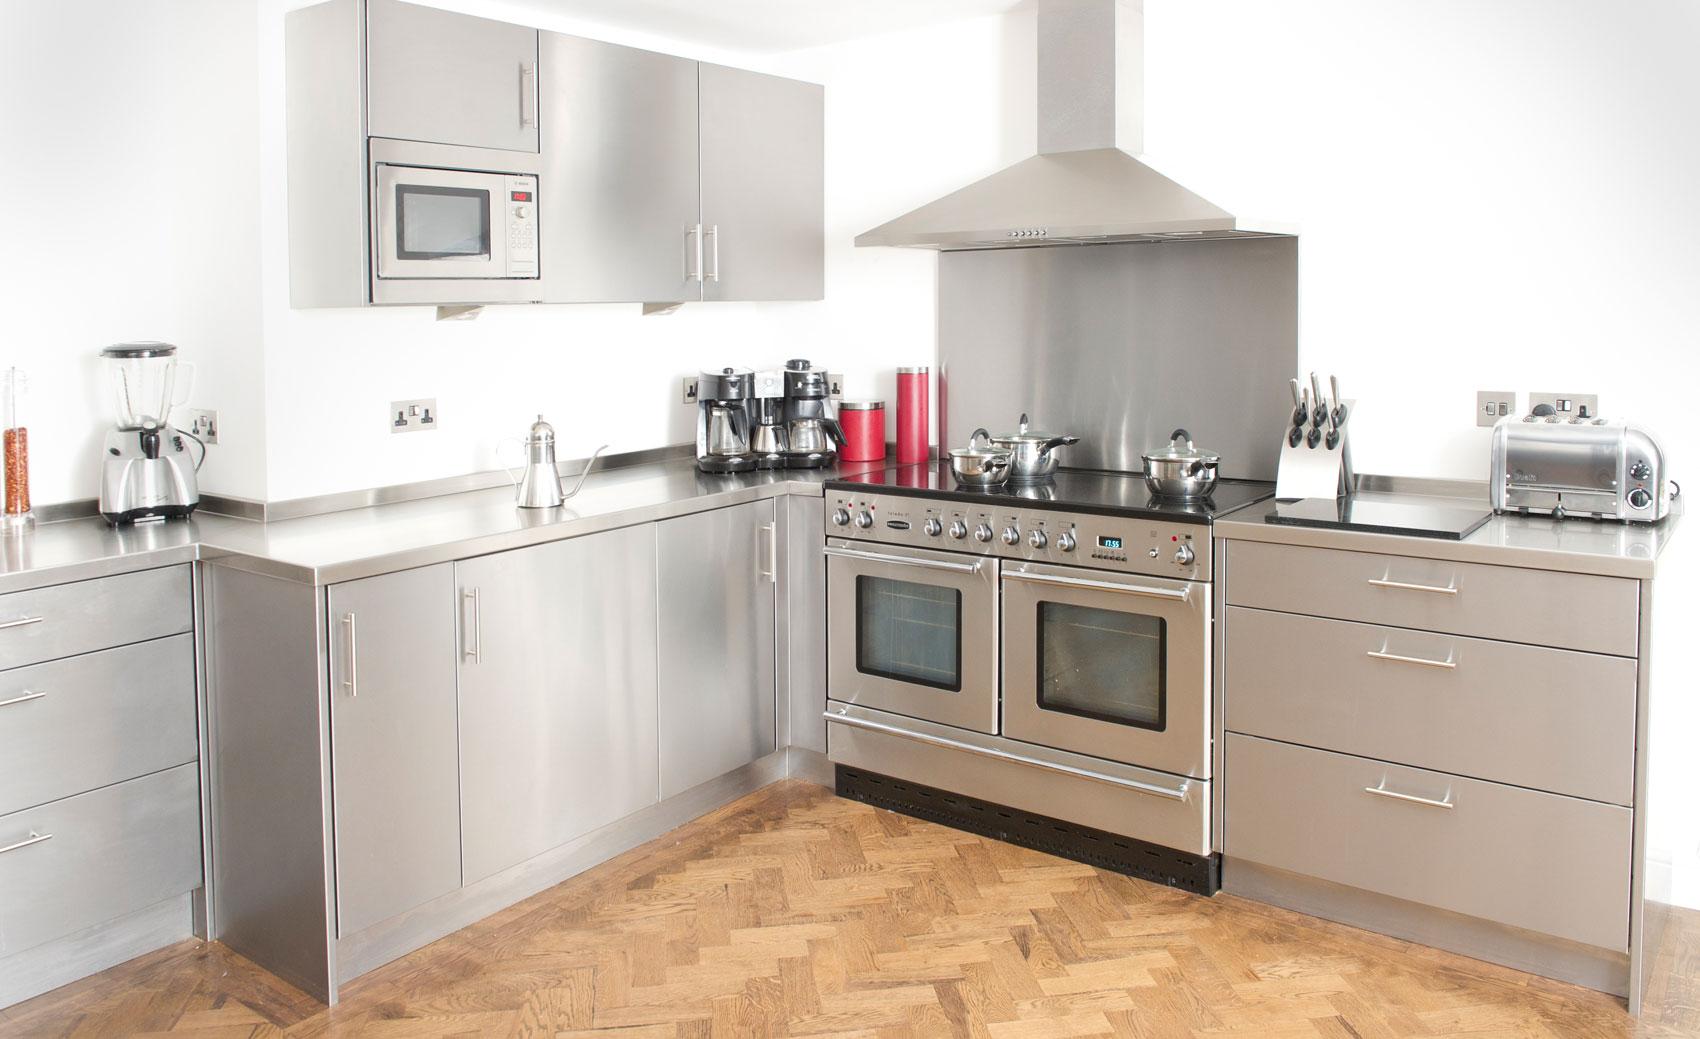 Stainless steel kitchen work surfaces -  Stainless Steel Kitchen Cabinet Worktops Splash Backs Uk Cavendish Equipment Download